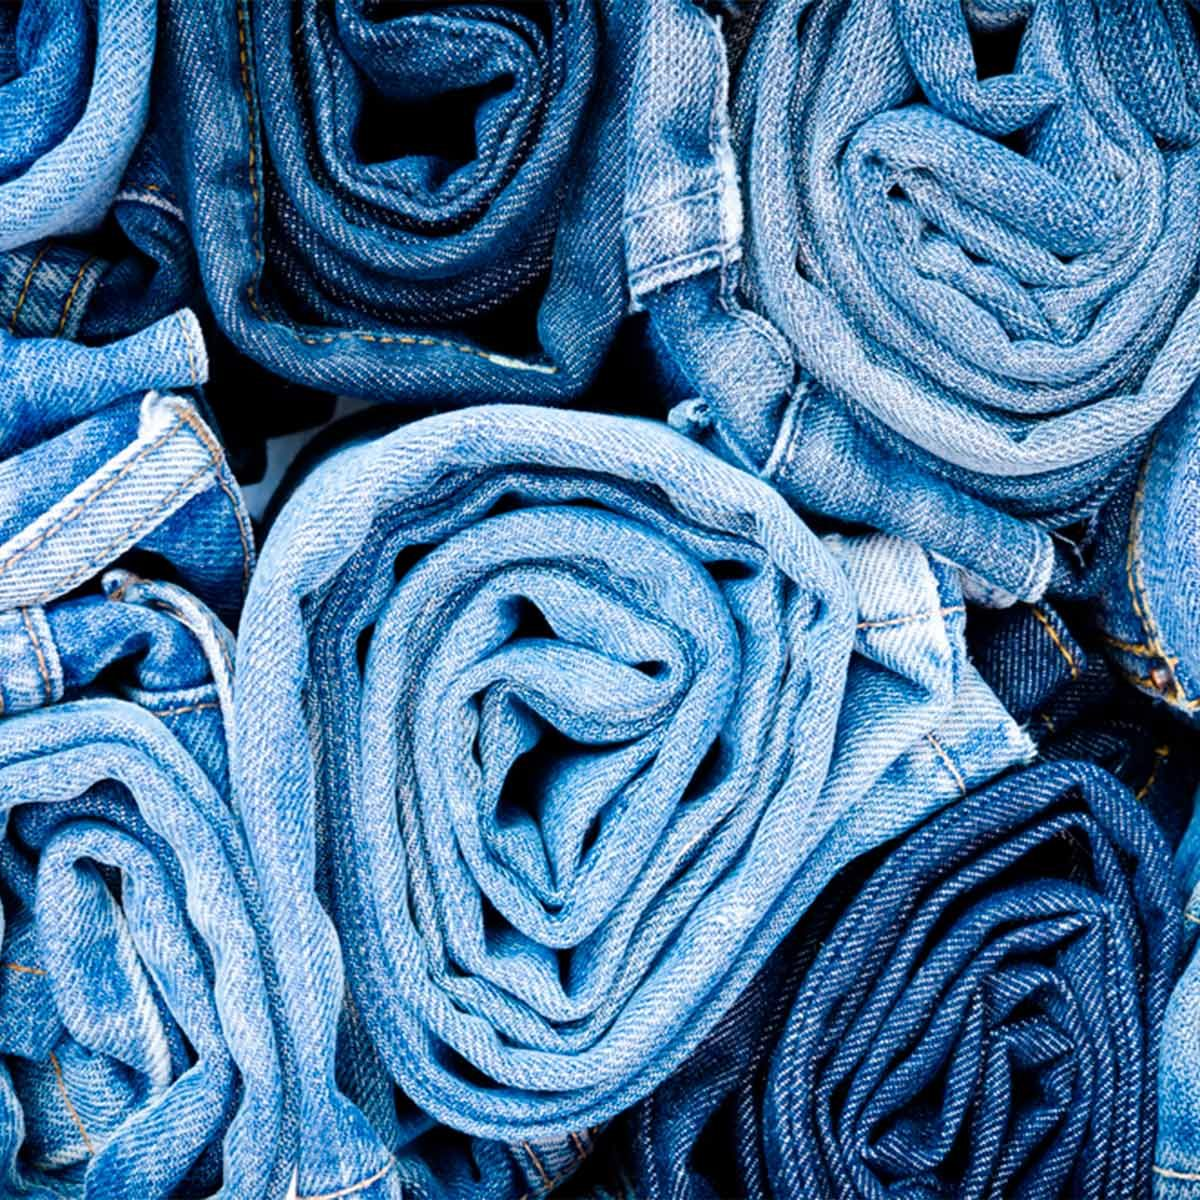 jeans laundry hack